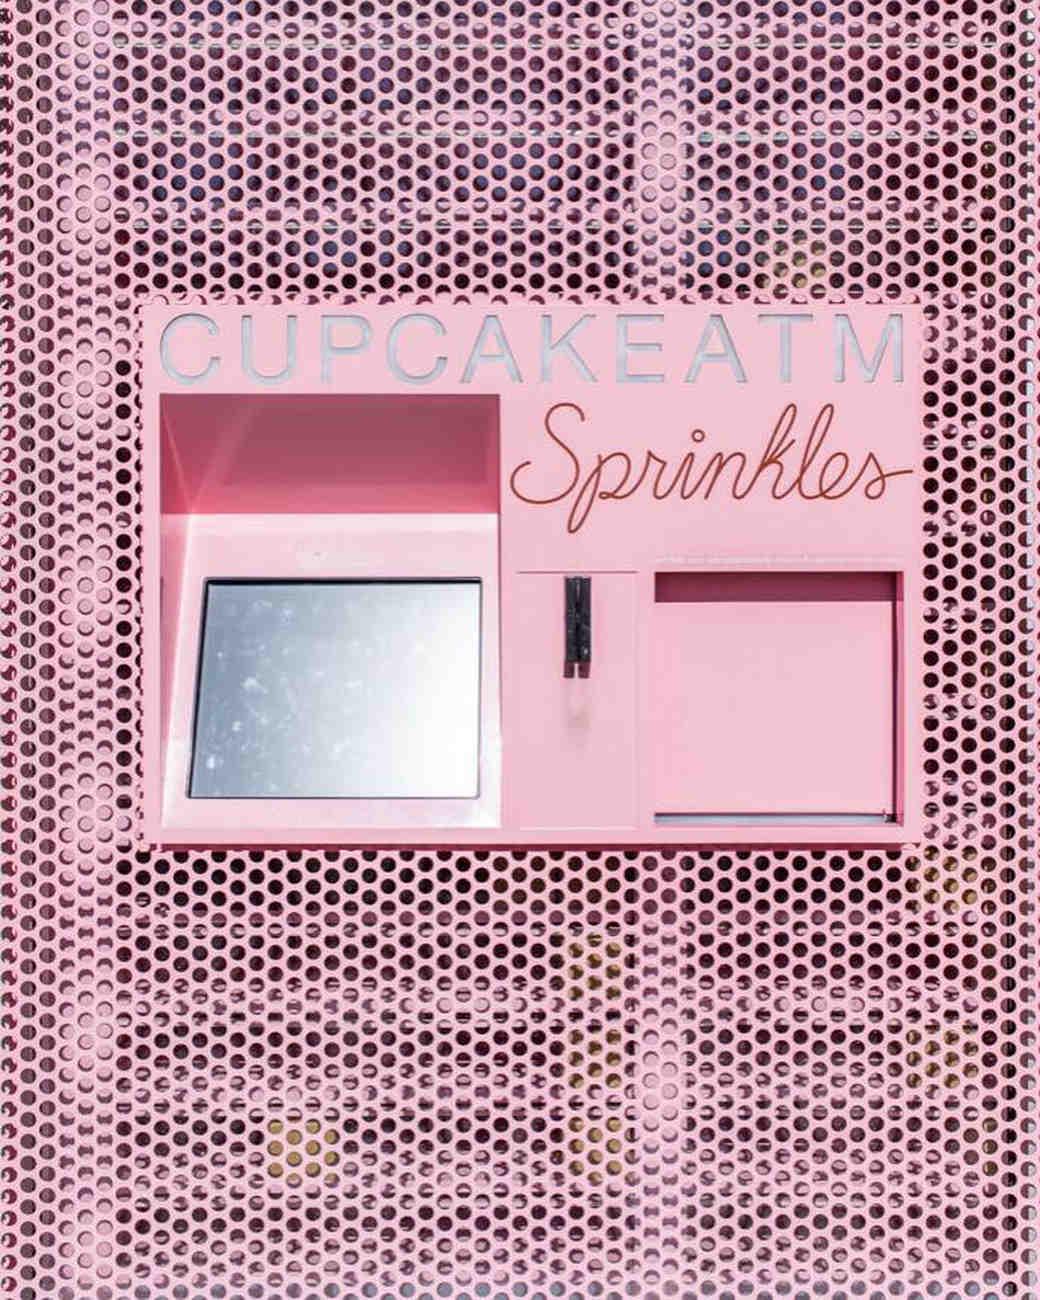 beverly hills bachelorette sprinkles cupcake atm